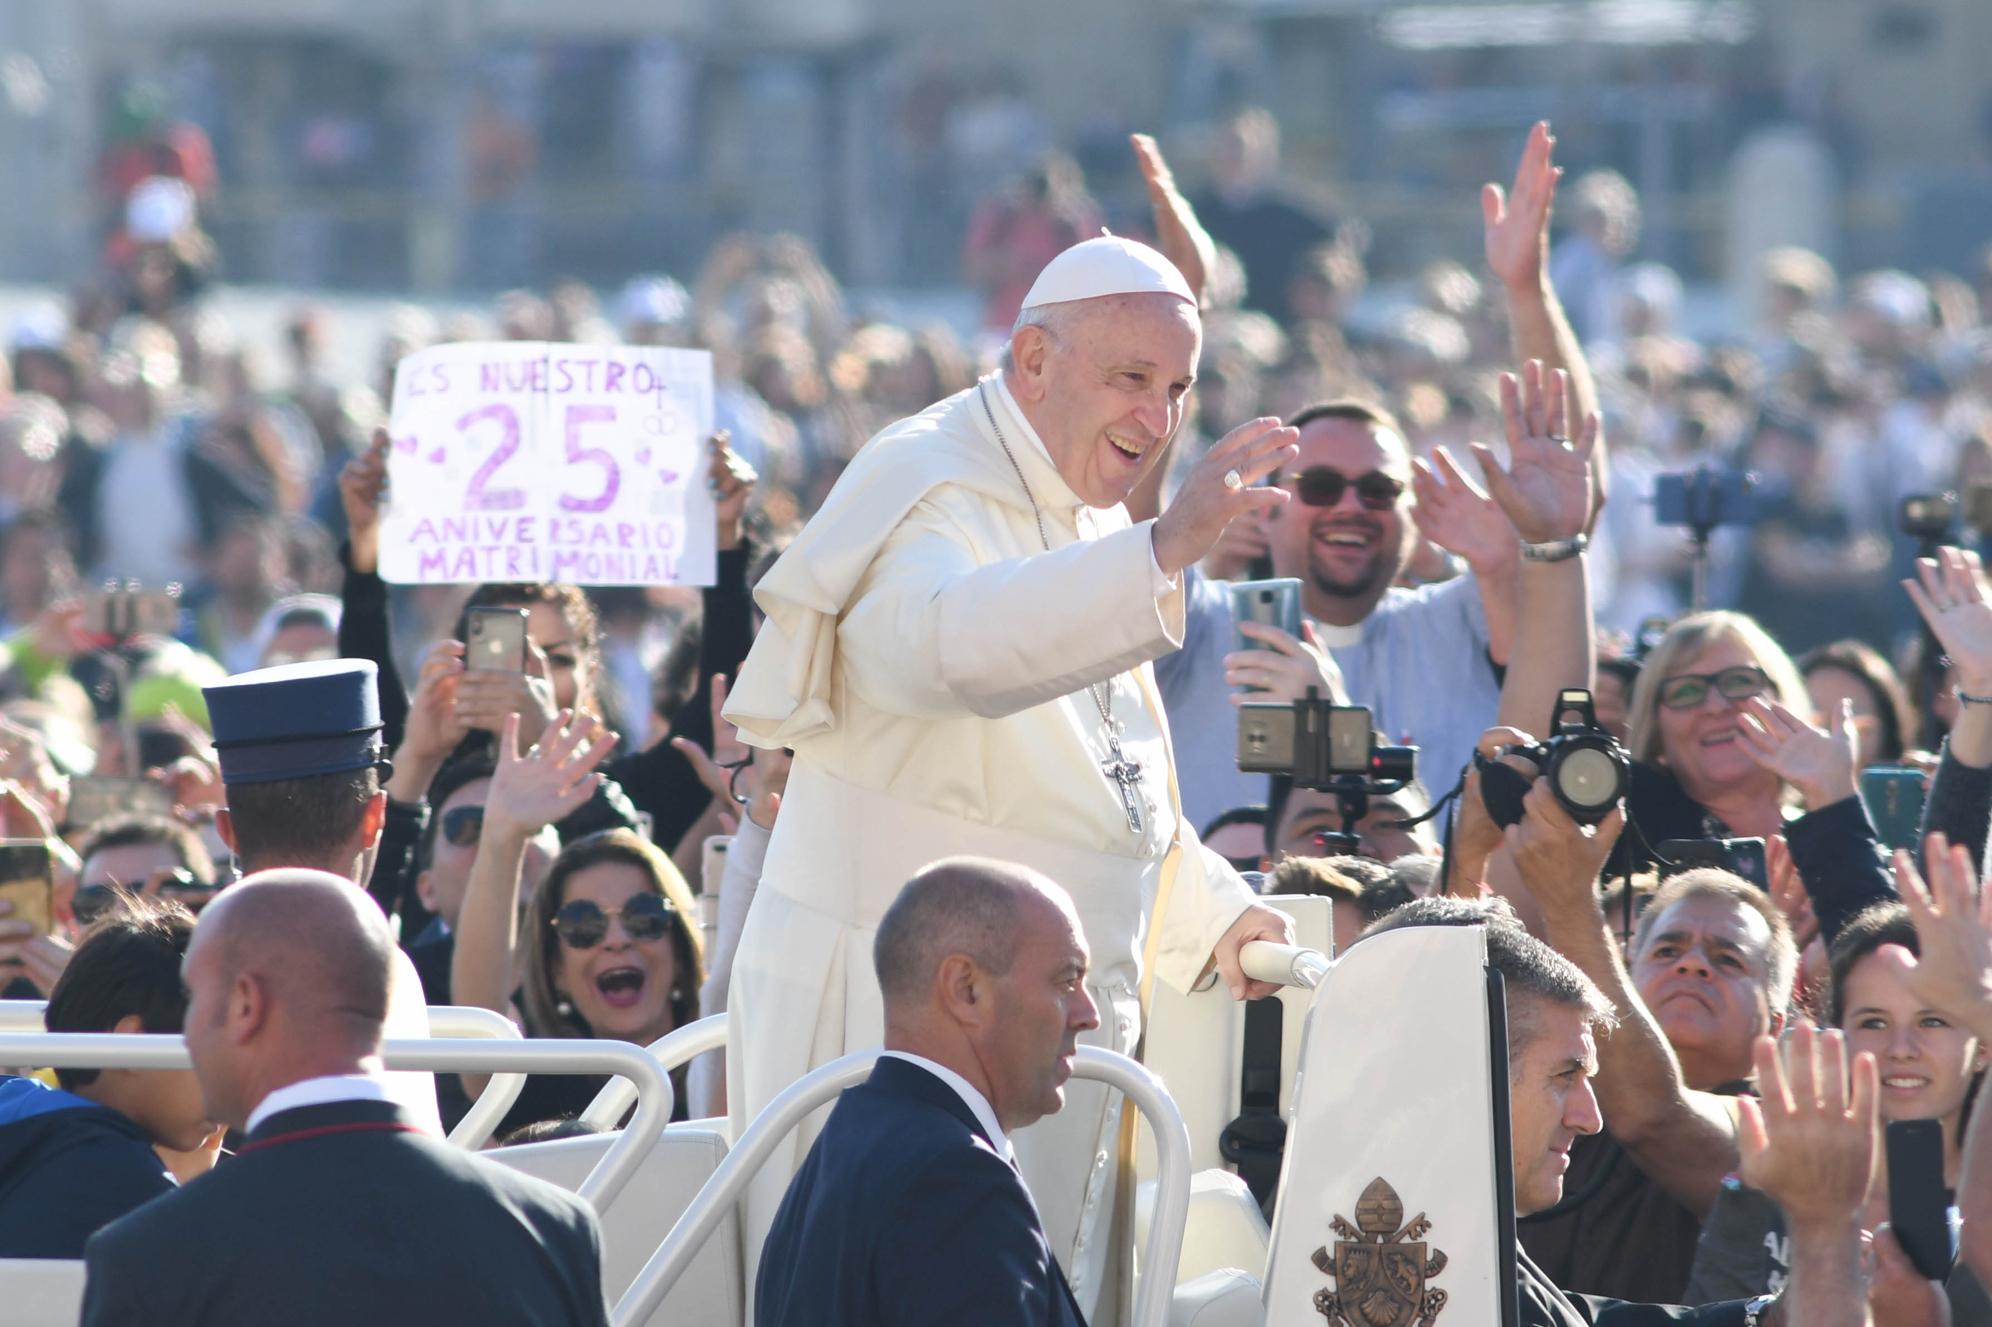 Anniversario Matrimonio Vaticano.Vaticano 10 Ottobre 2018 Udienza Generale Di Papa Francesco In